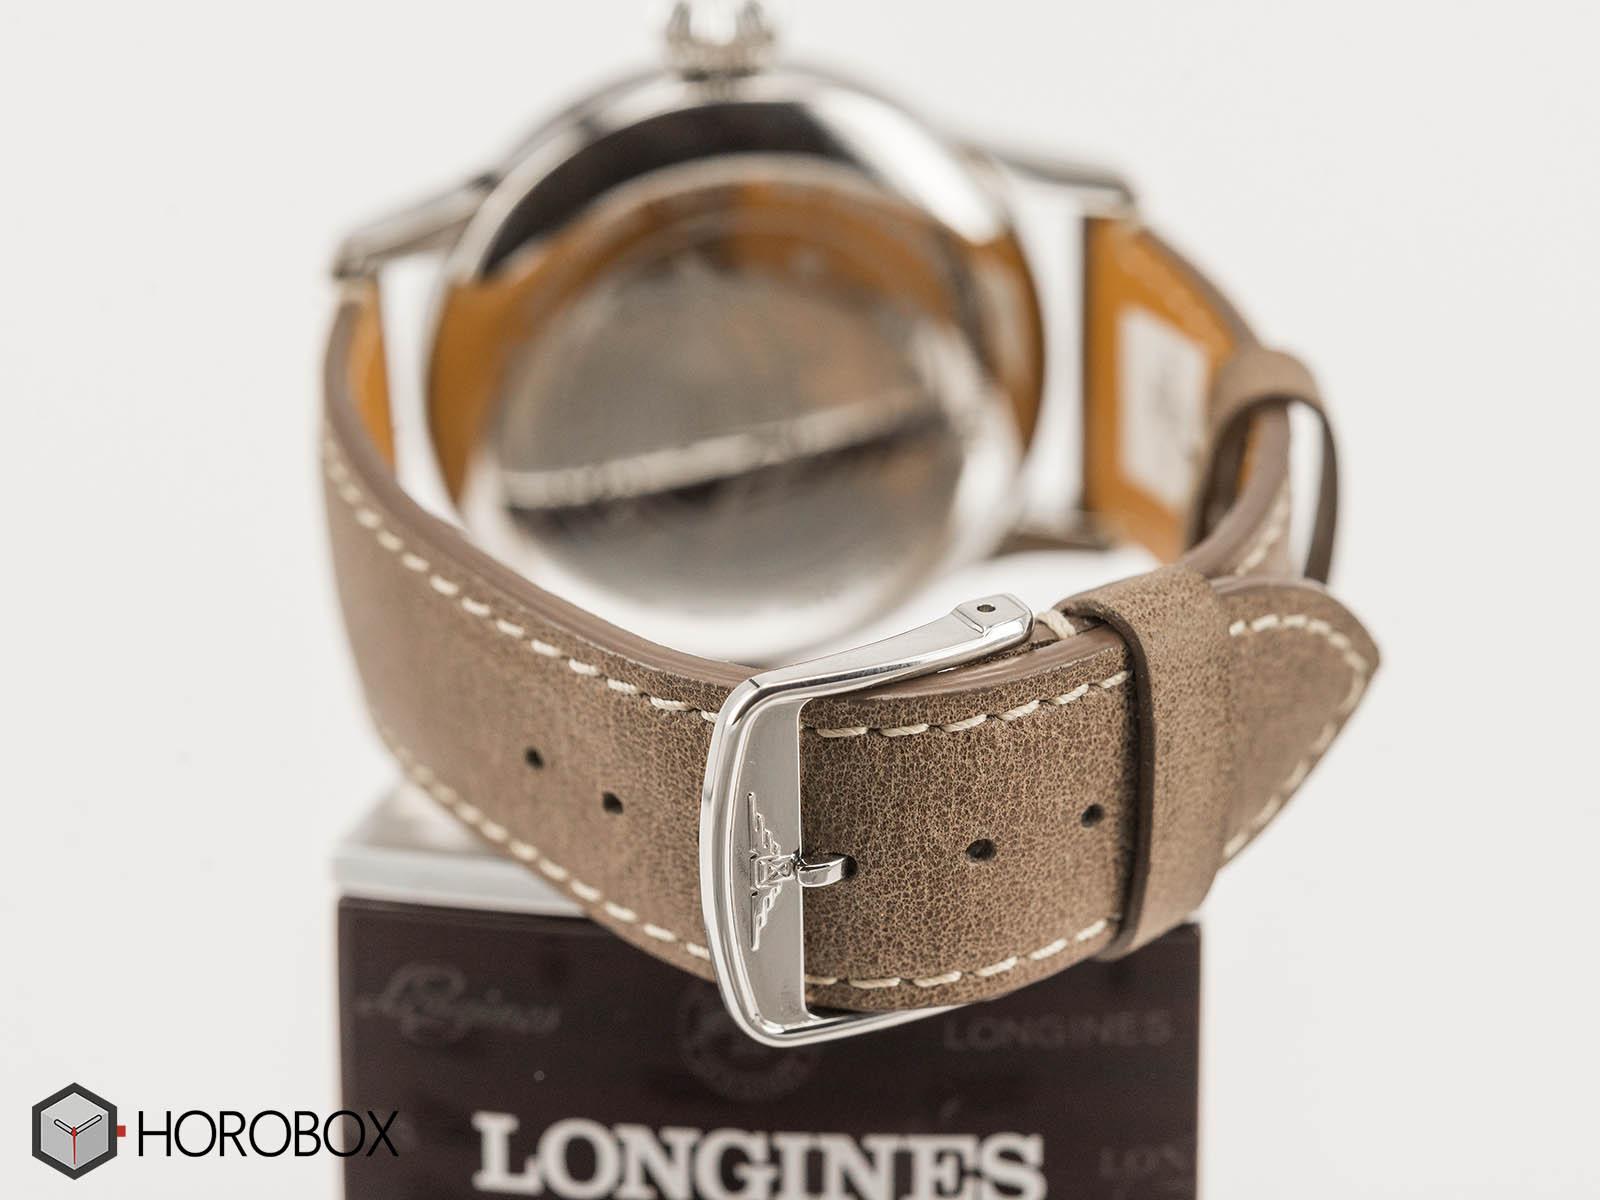 Longines-Lindbergh-Hour-Angle-Watch-90th-Anniversary-4.jpg